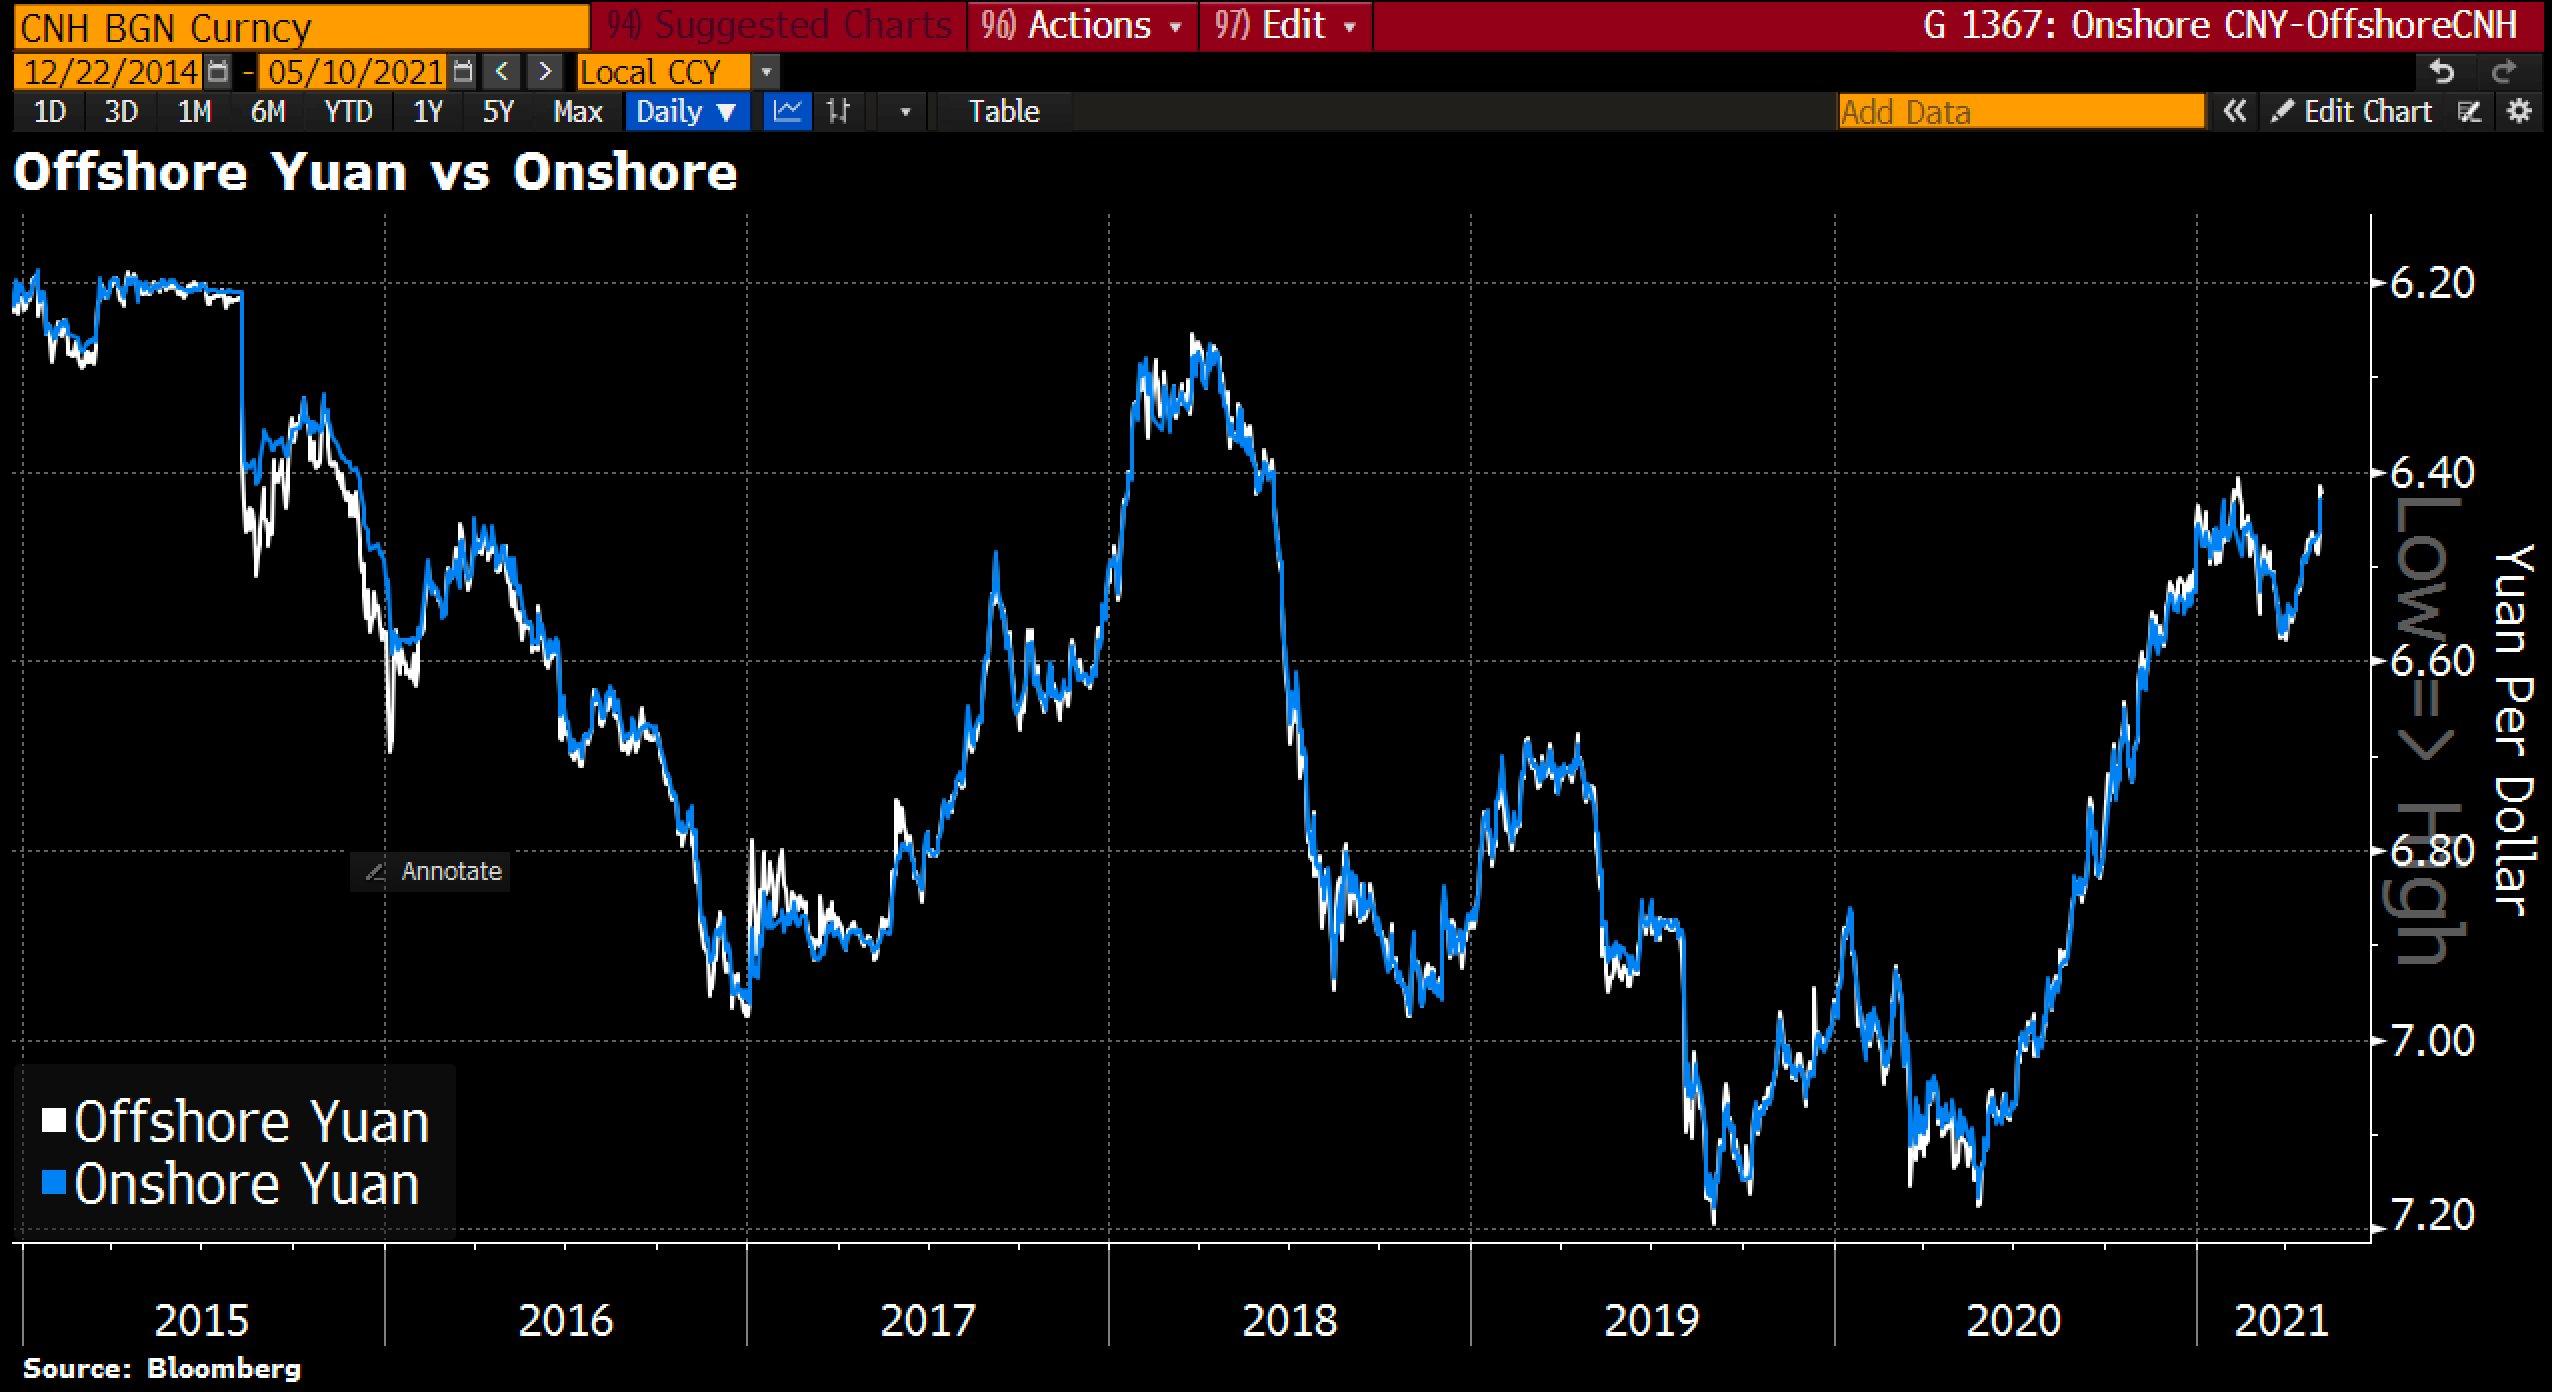 Chinese yuan unwinds 2021 decline to reach highest since 2018